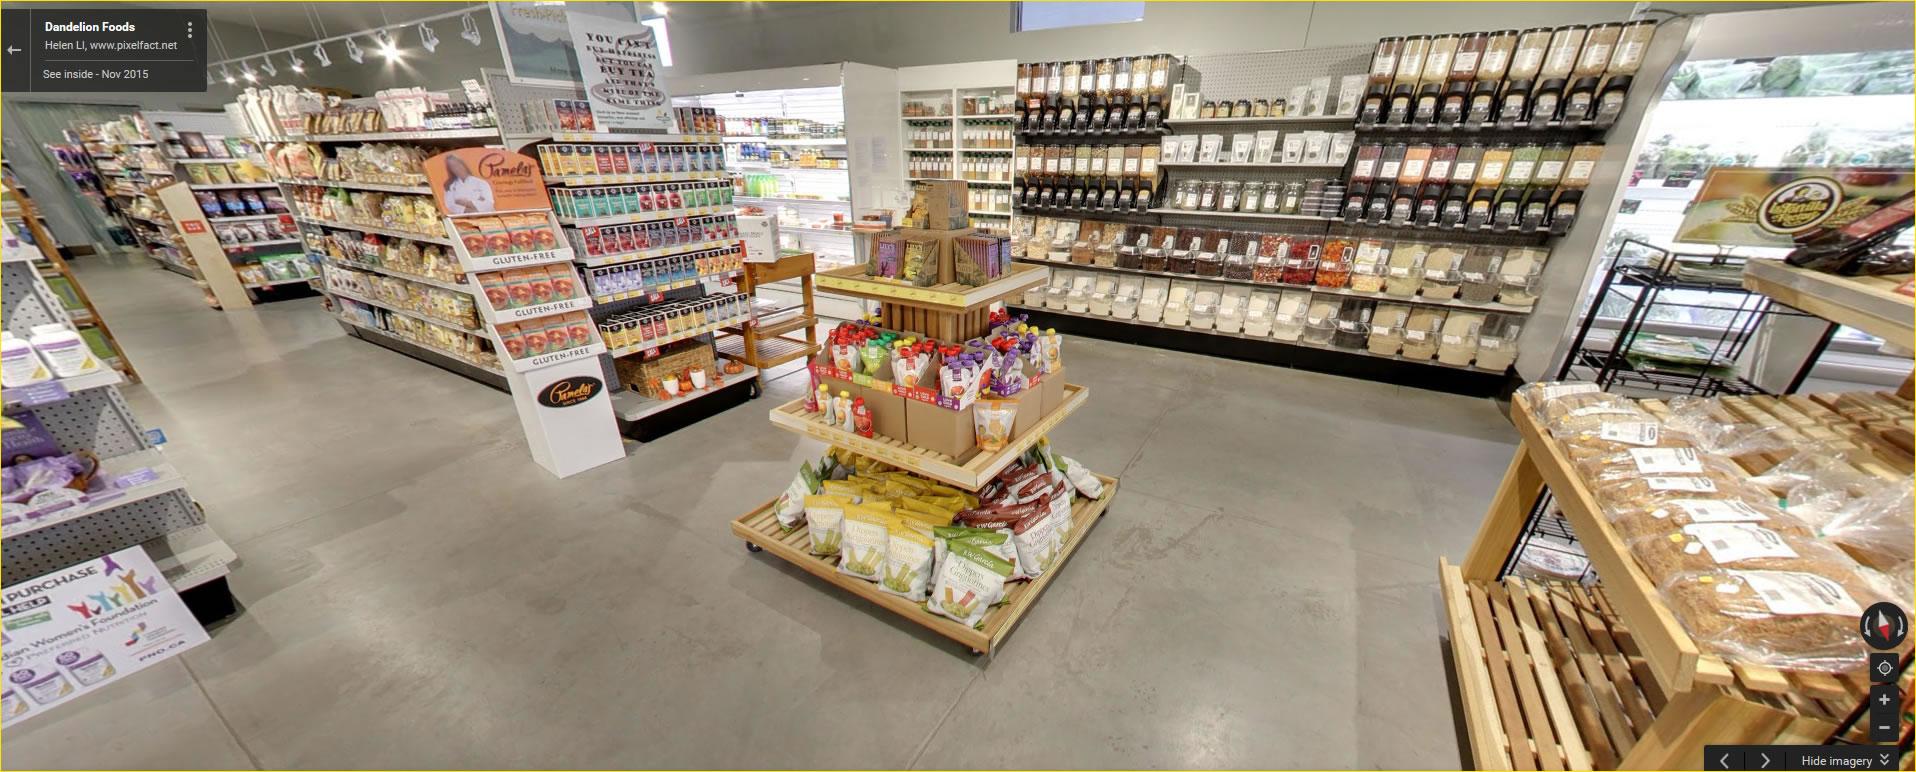 Click for a Google virtual tour of Dandelion Foods